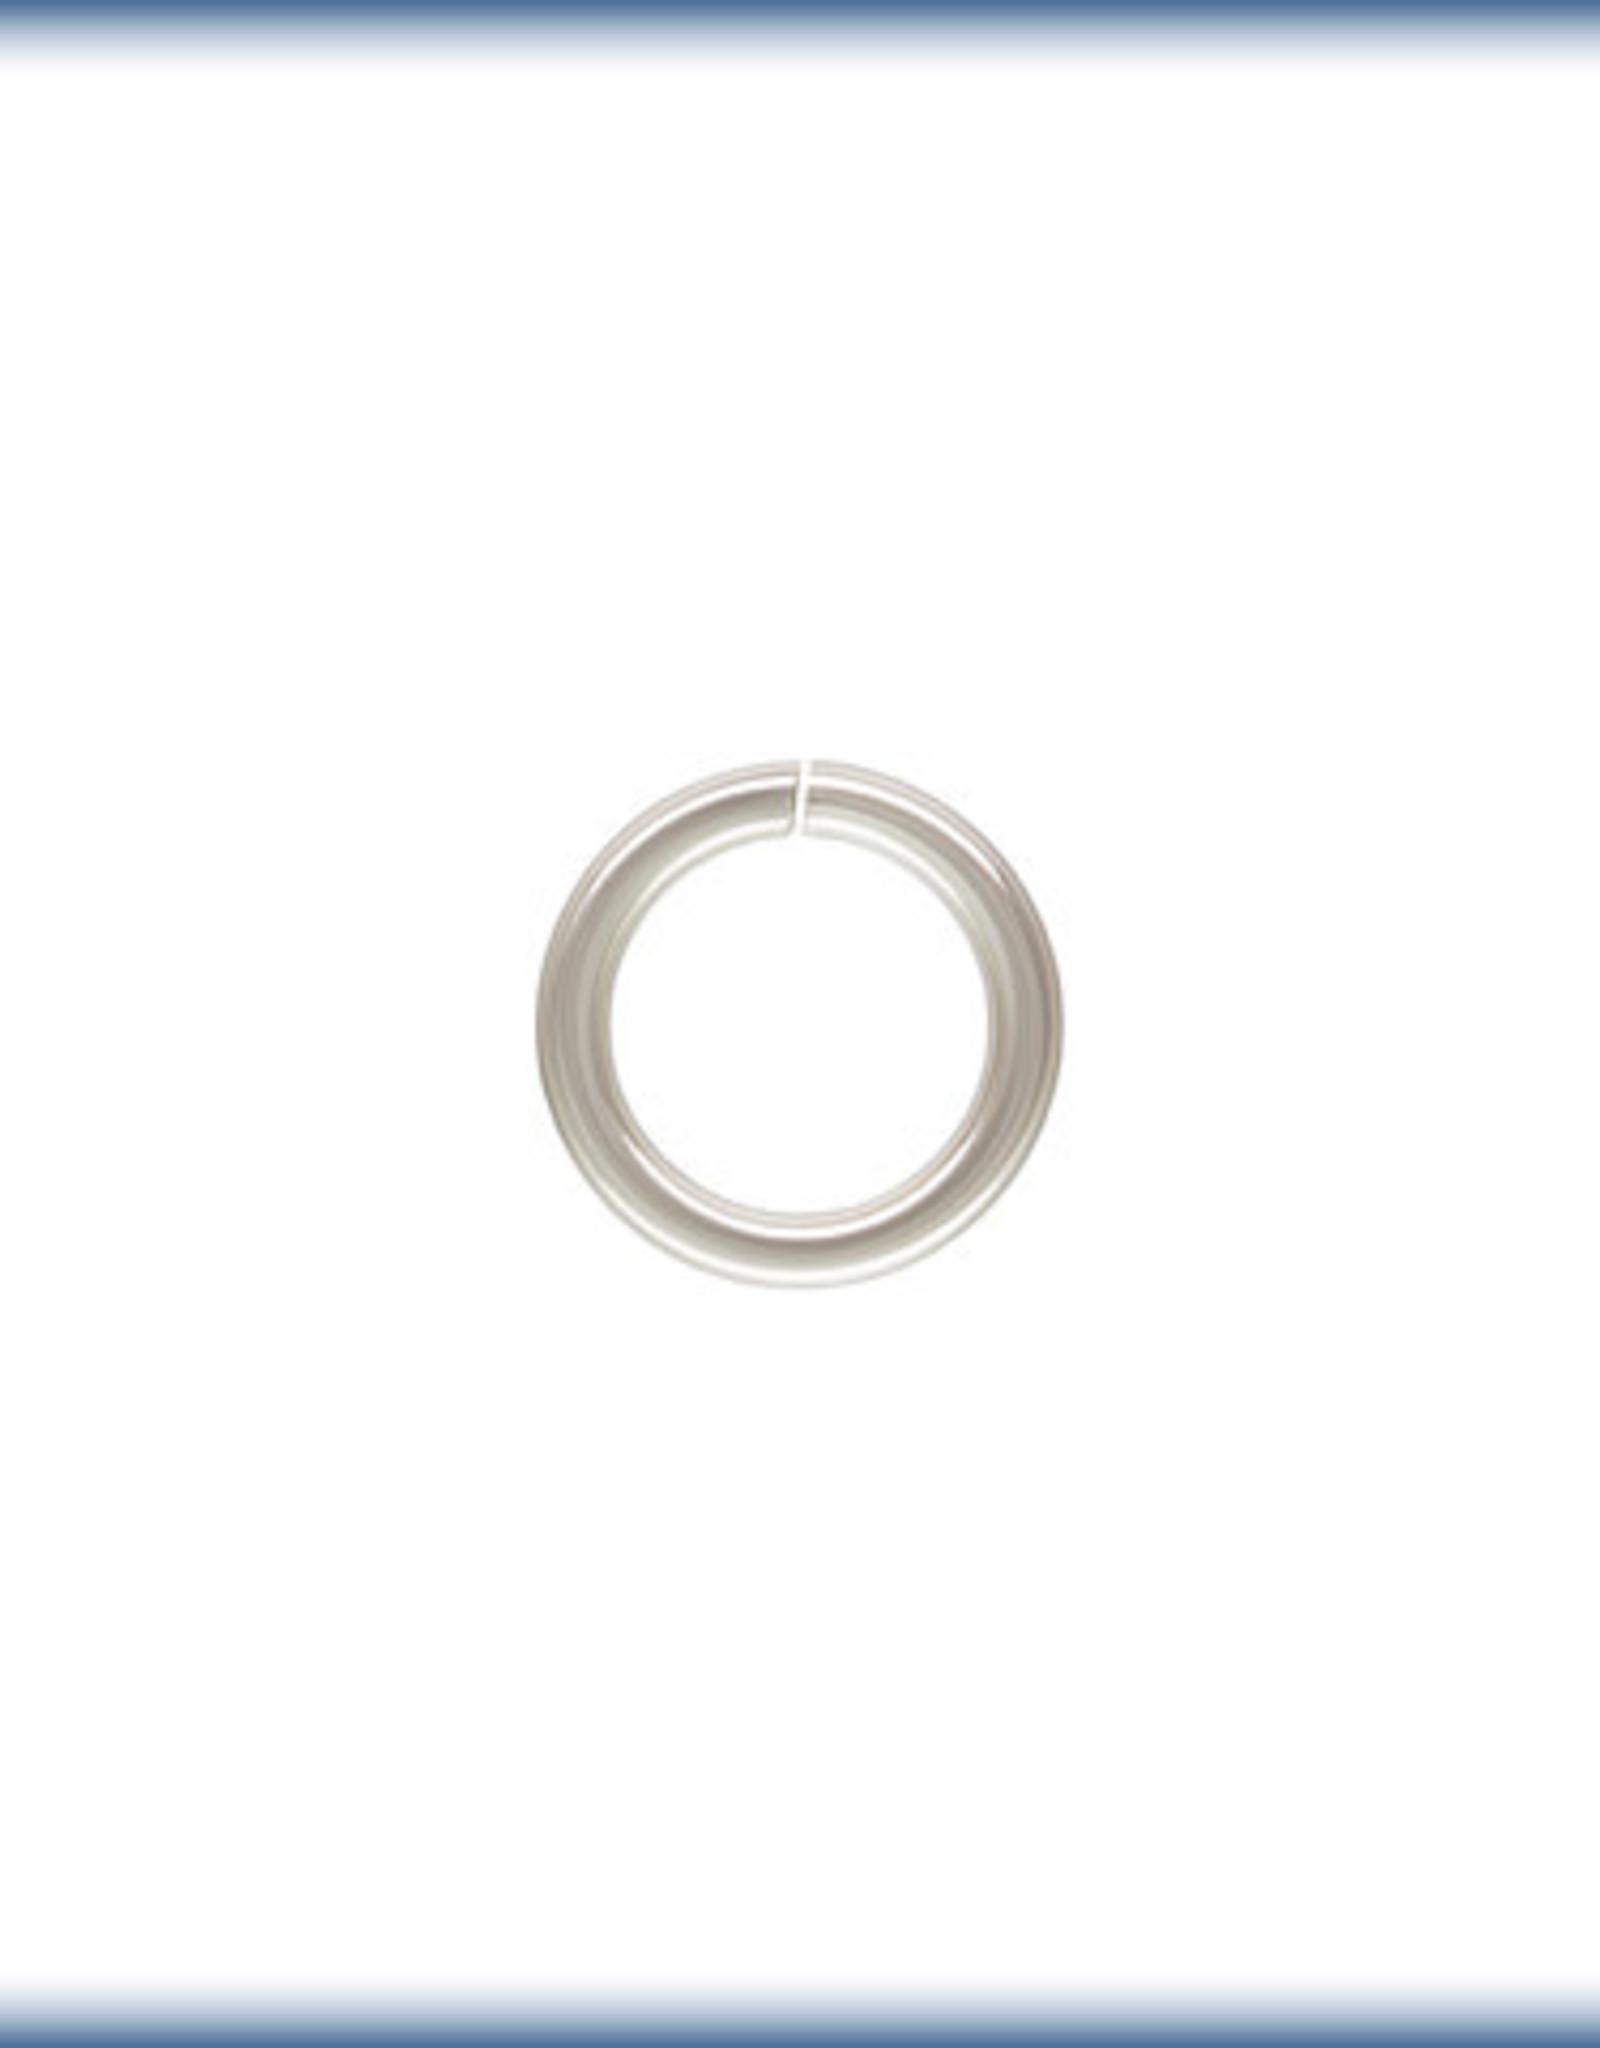 6mm Jump Rings 20ga Sterling Silver Qty 10